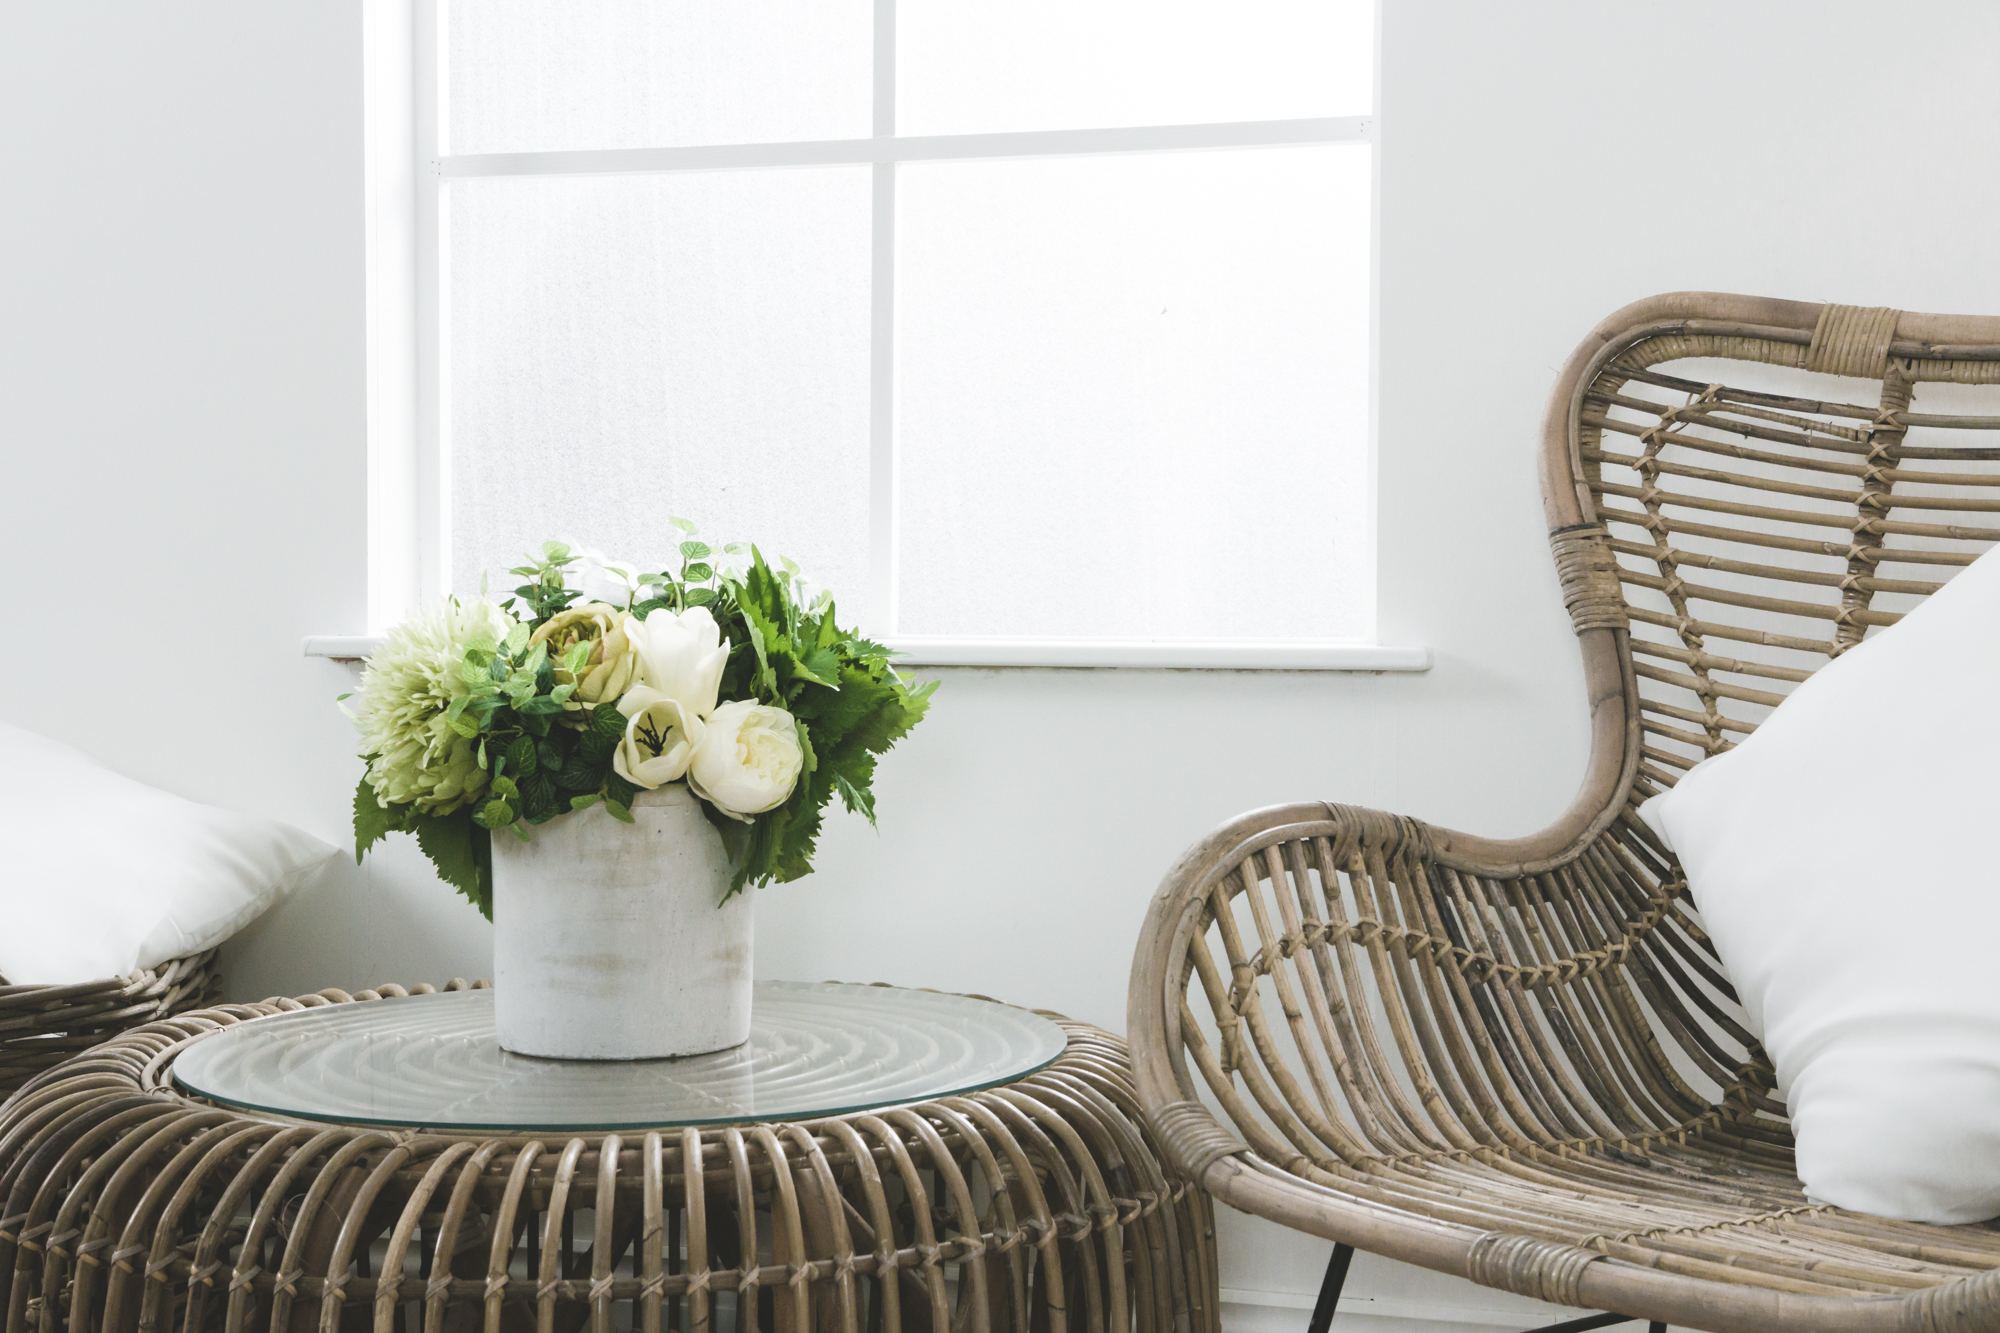 recipeflowers-2.jpg